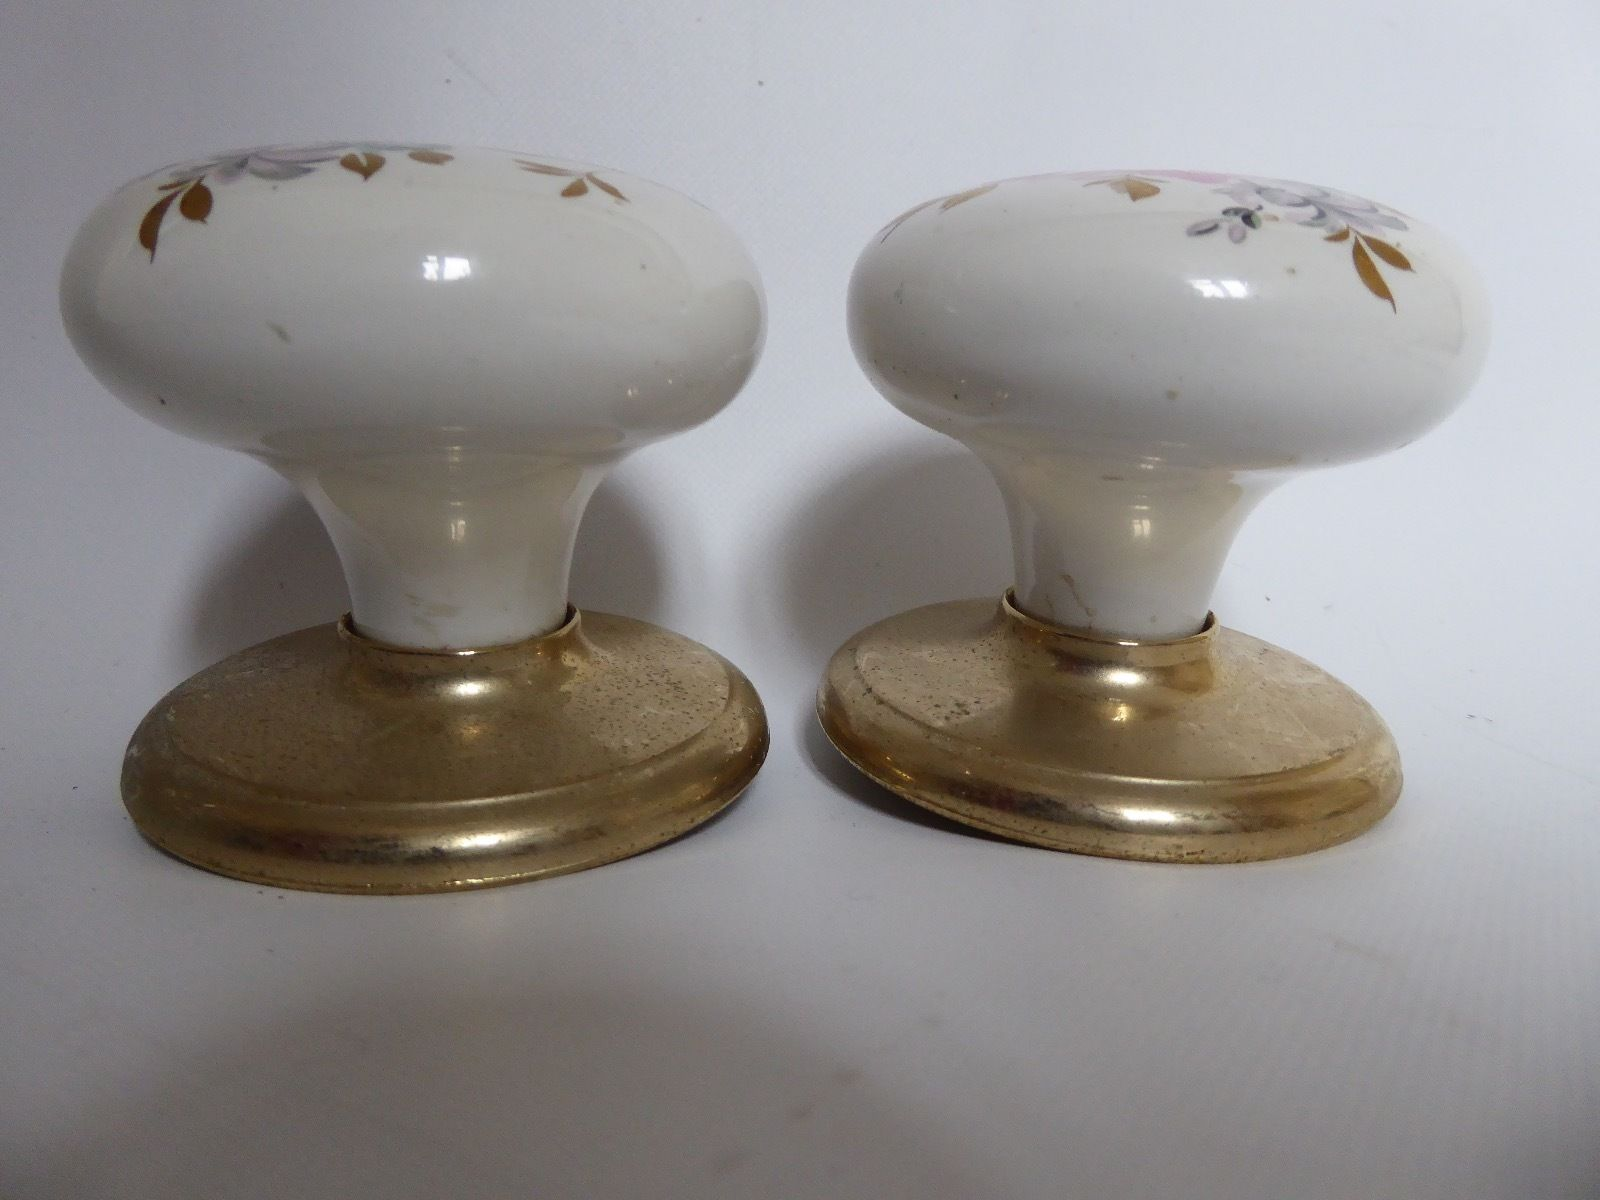 gainsborough porcelain door knobs photo - 4